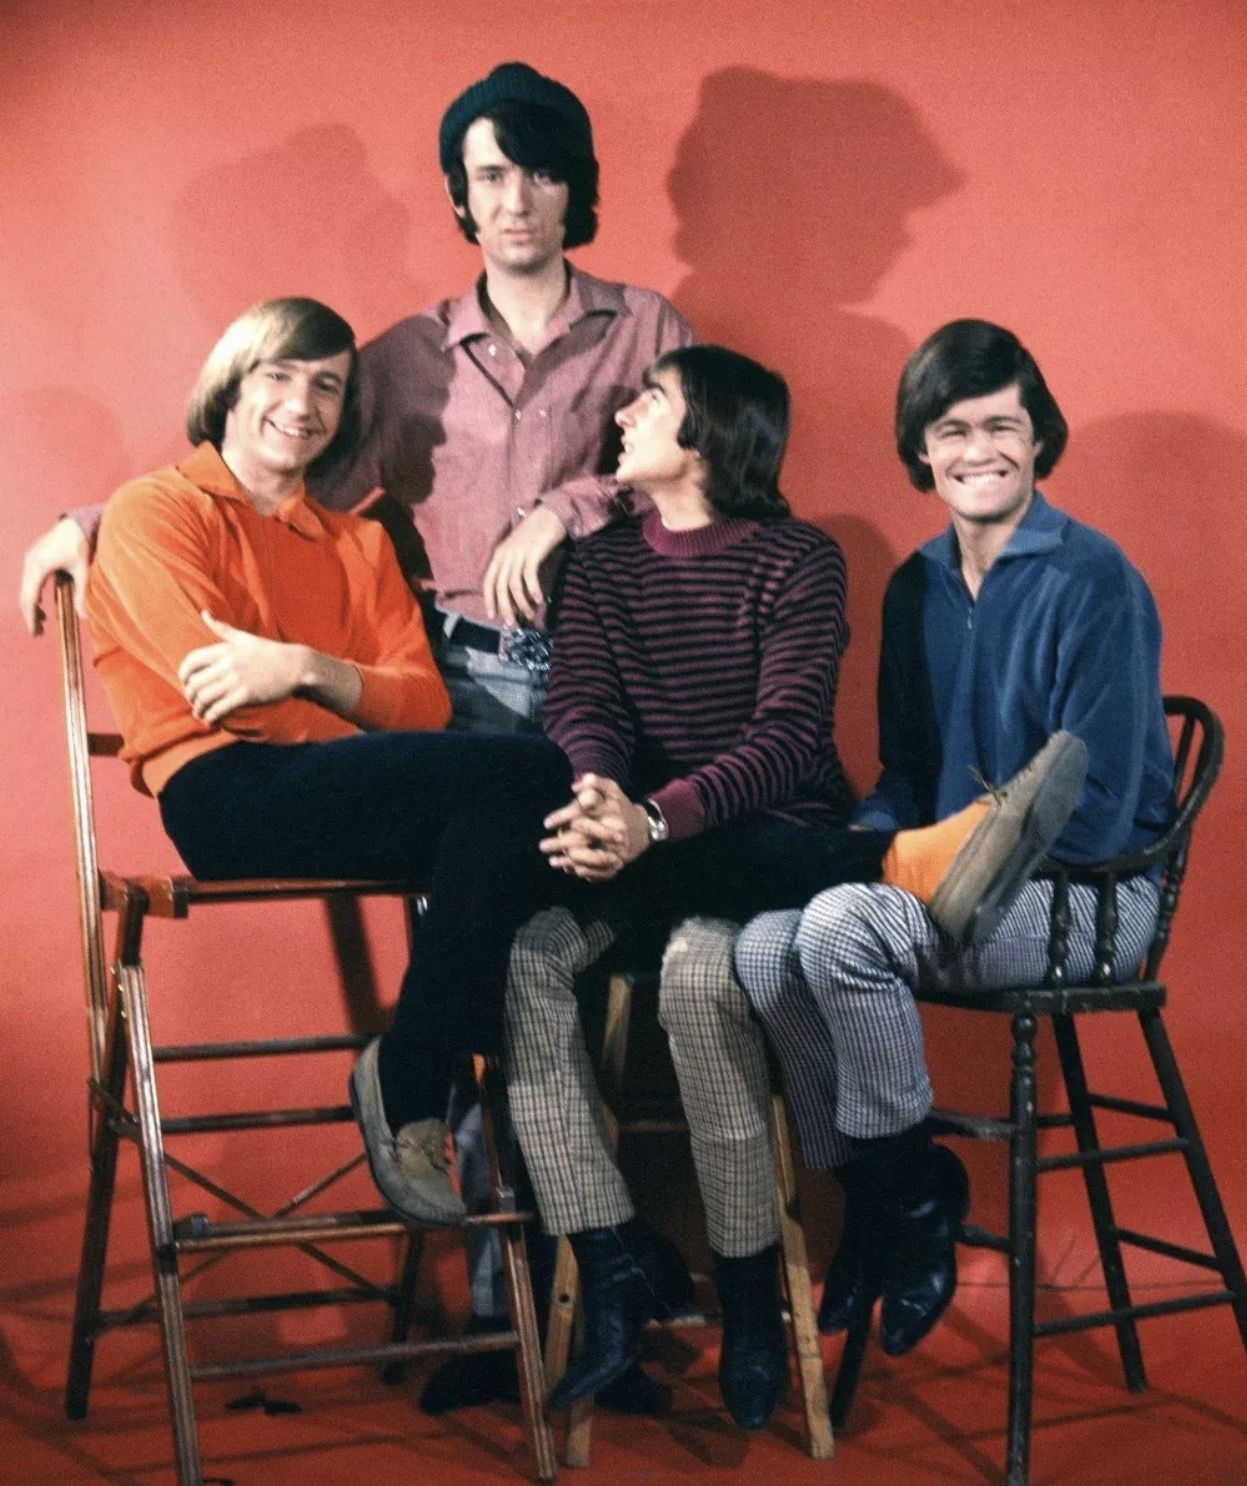 The Monkees - 1966 | The Monkees in 2019 | The monkees